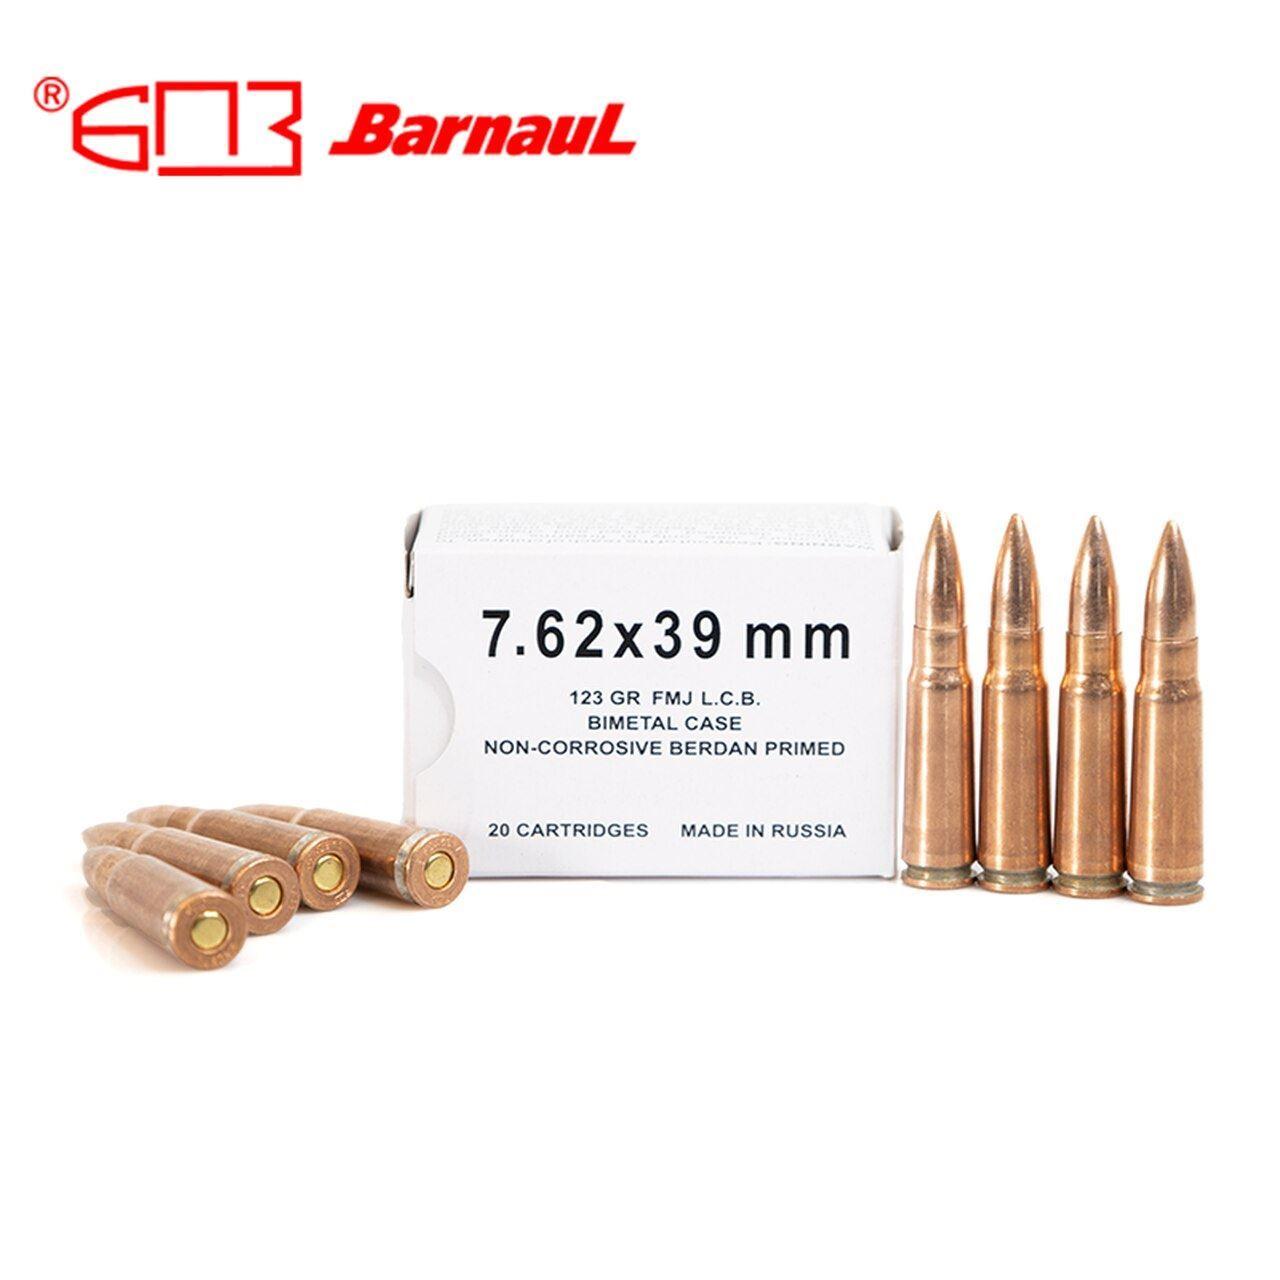 0155676_barnaul-762x39-123gr-fmj-bimetal-case-bullet-500rds-ammunition.jpeg